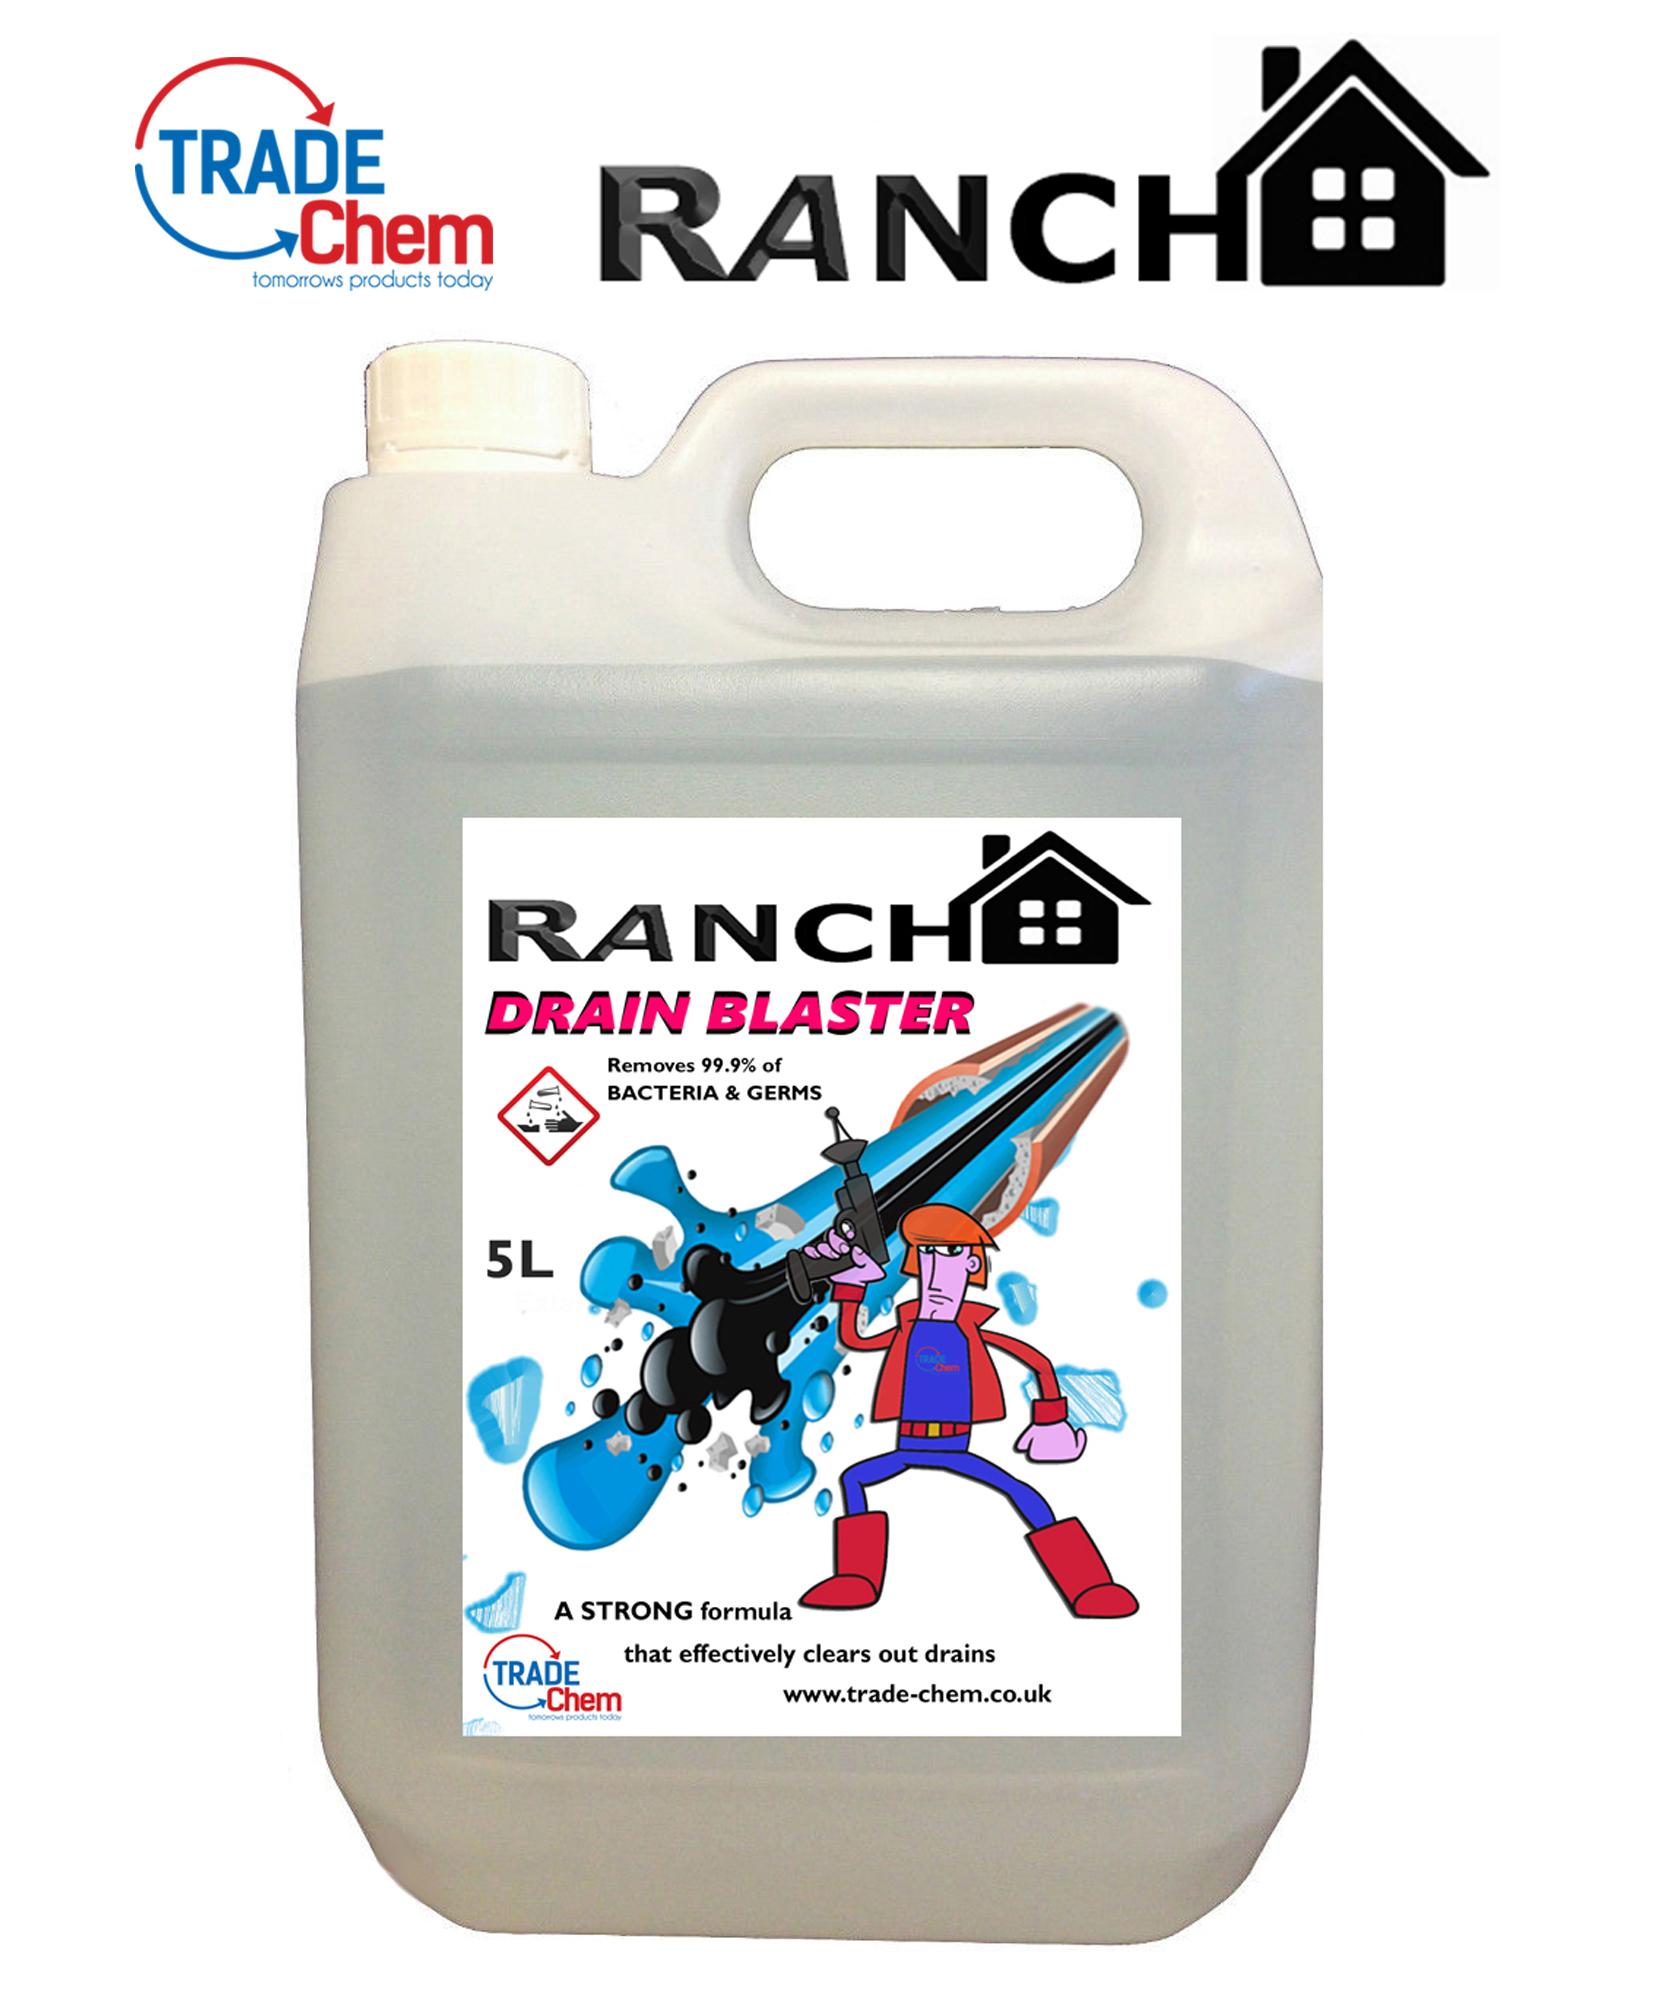 products-RANCH-DRAIN-BLASTER-5L-v2